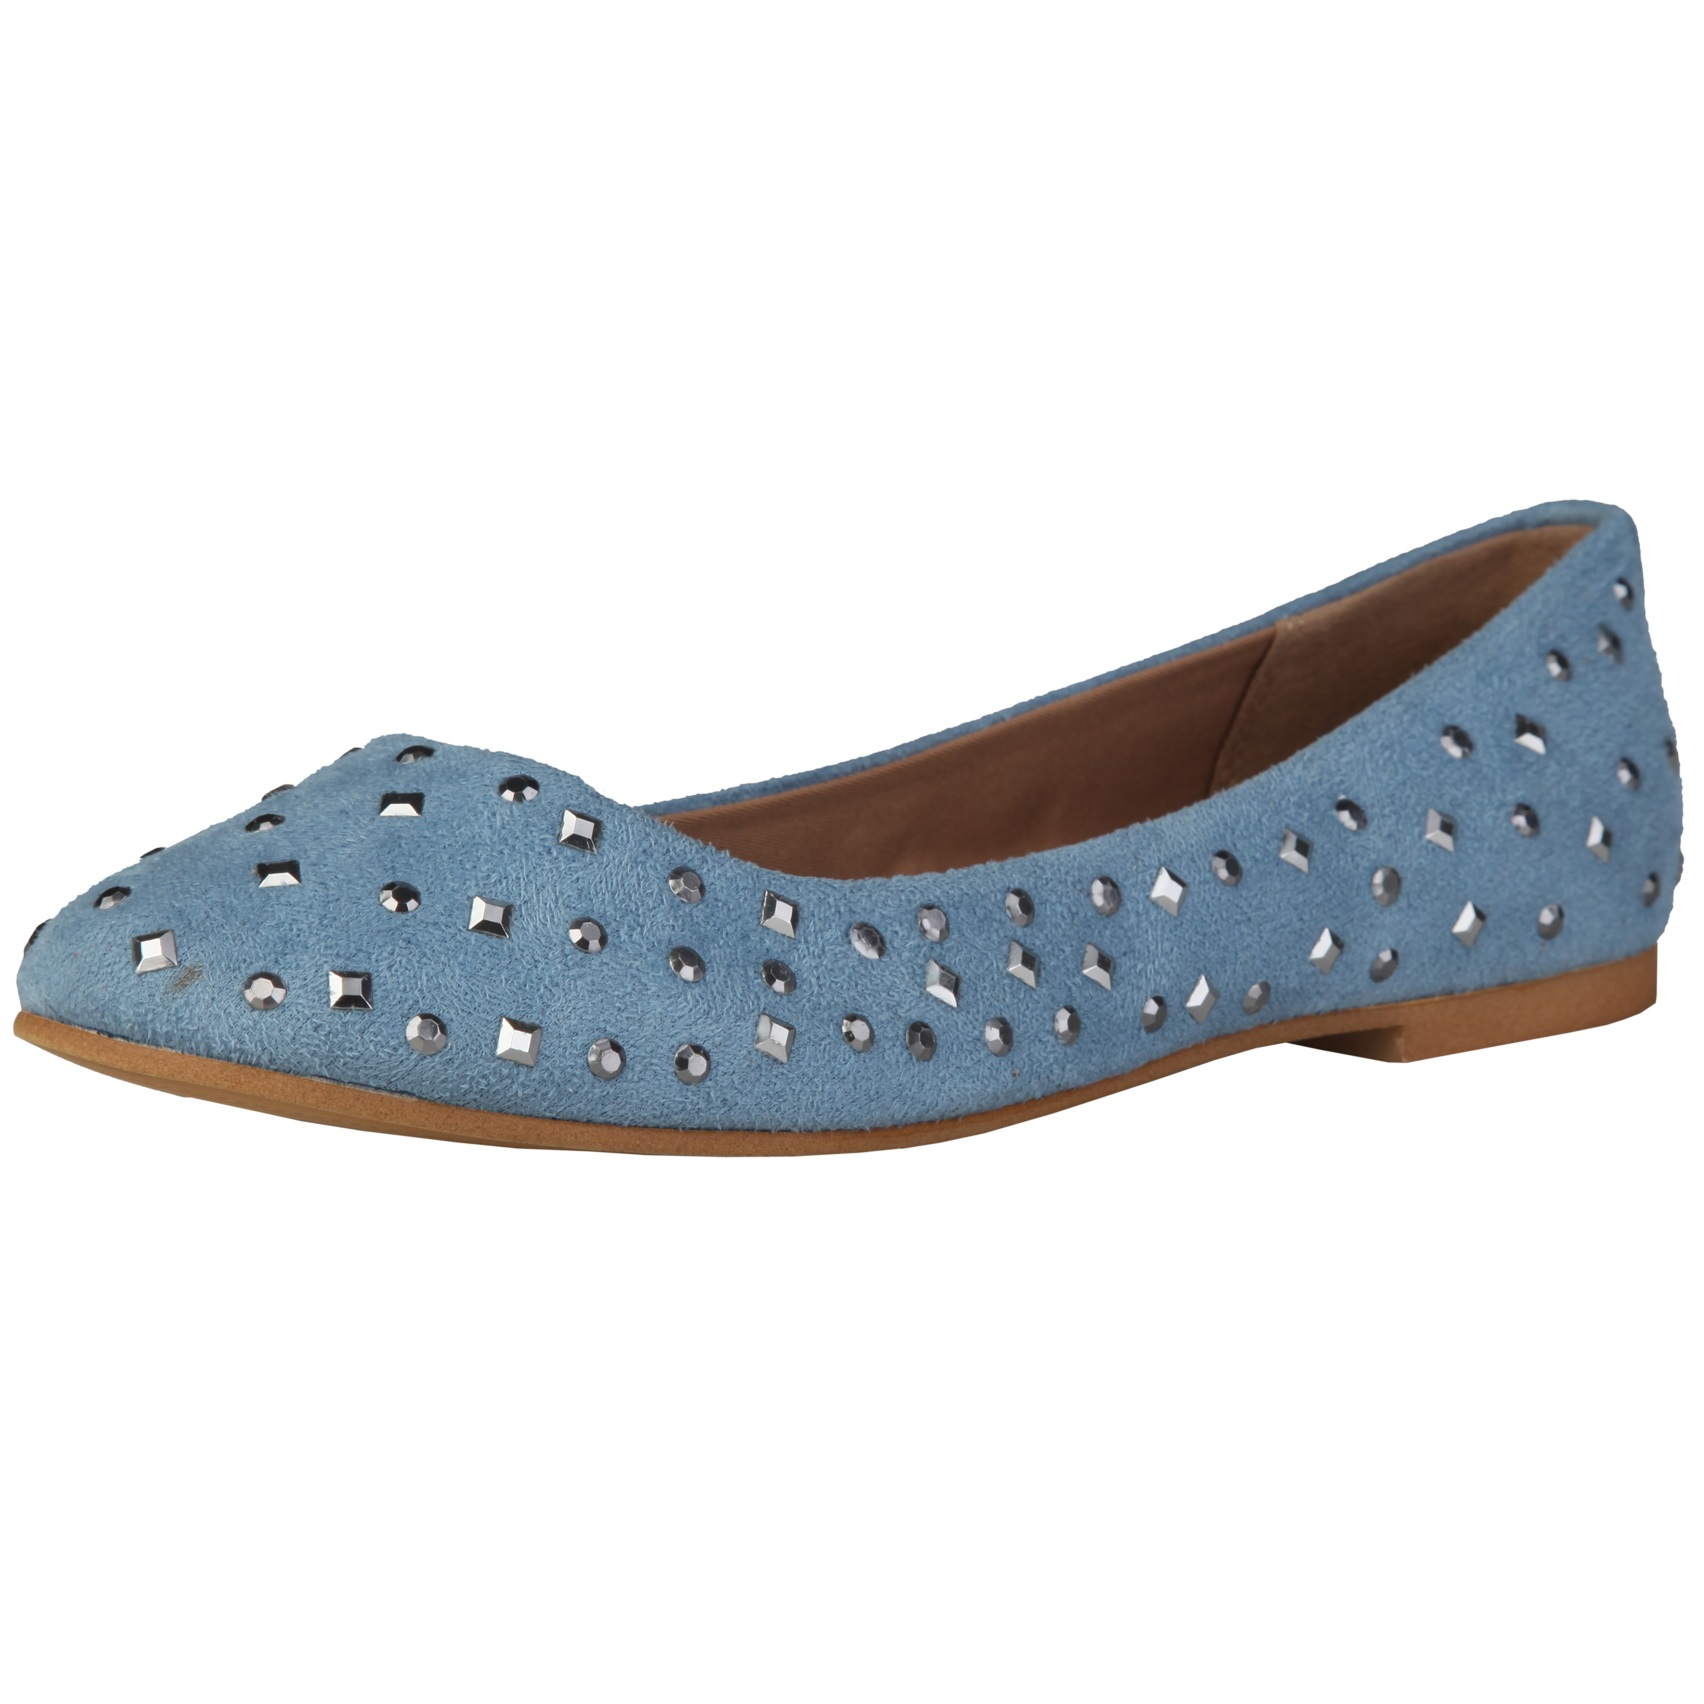 Sofia Loes Flat Shoes Cobalto Rf600151